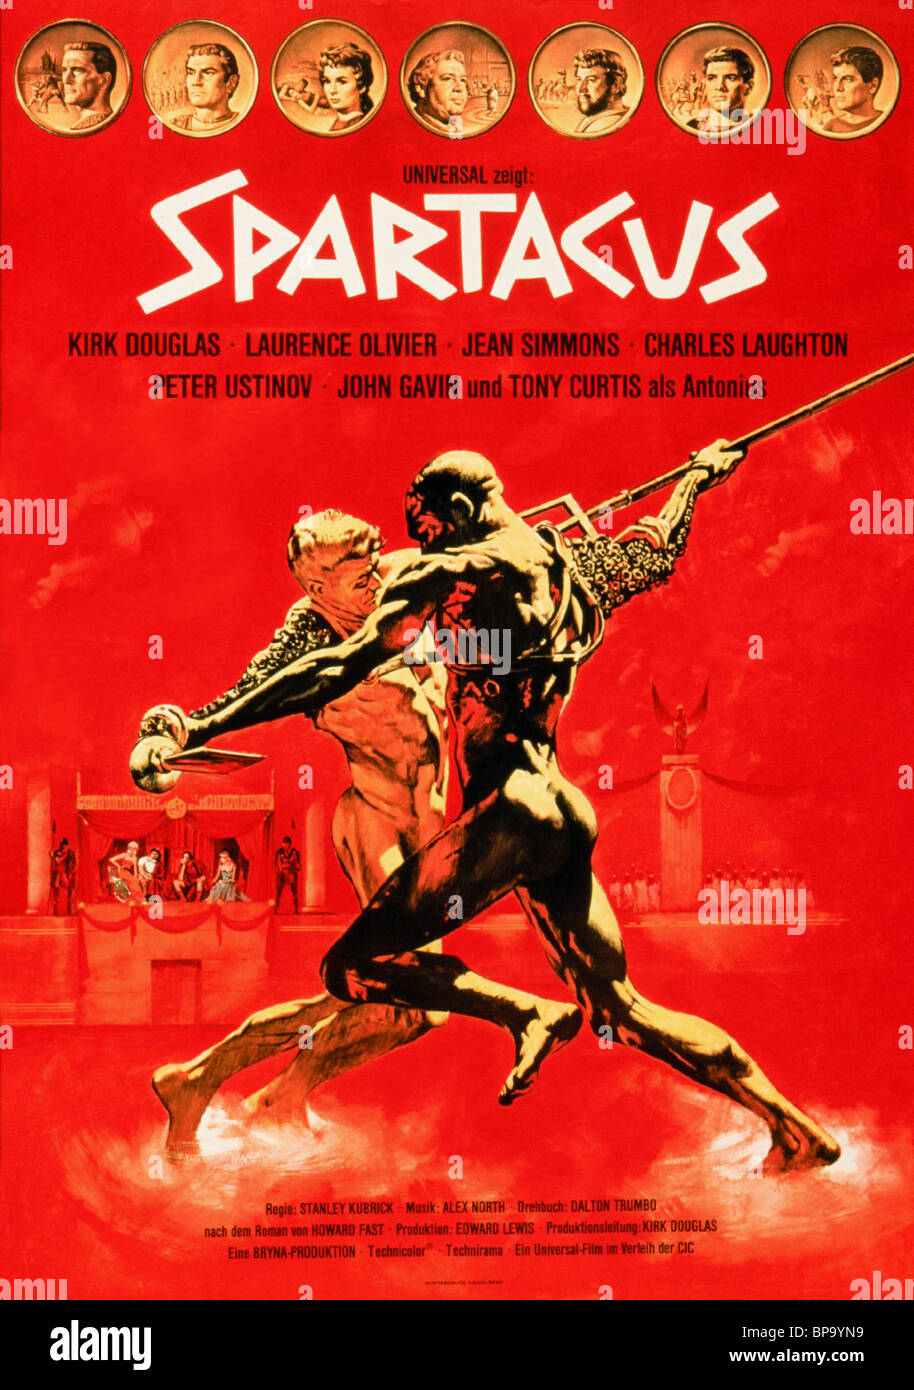 SPARTACUS Movie Poster 1960